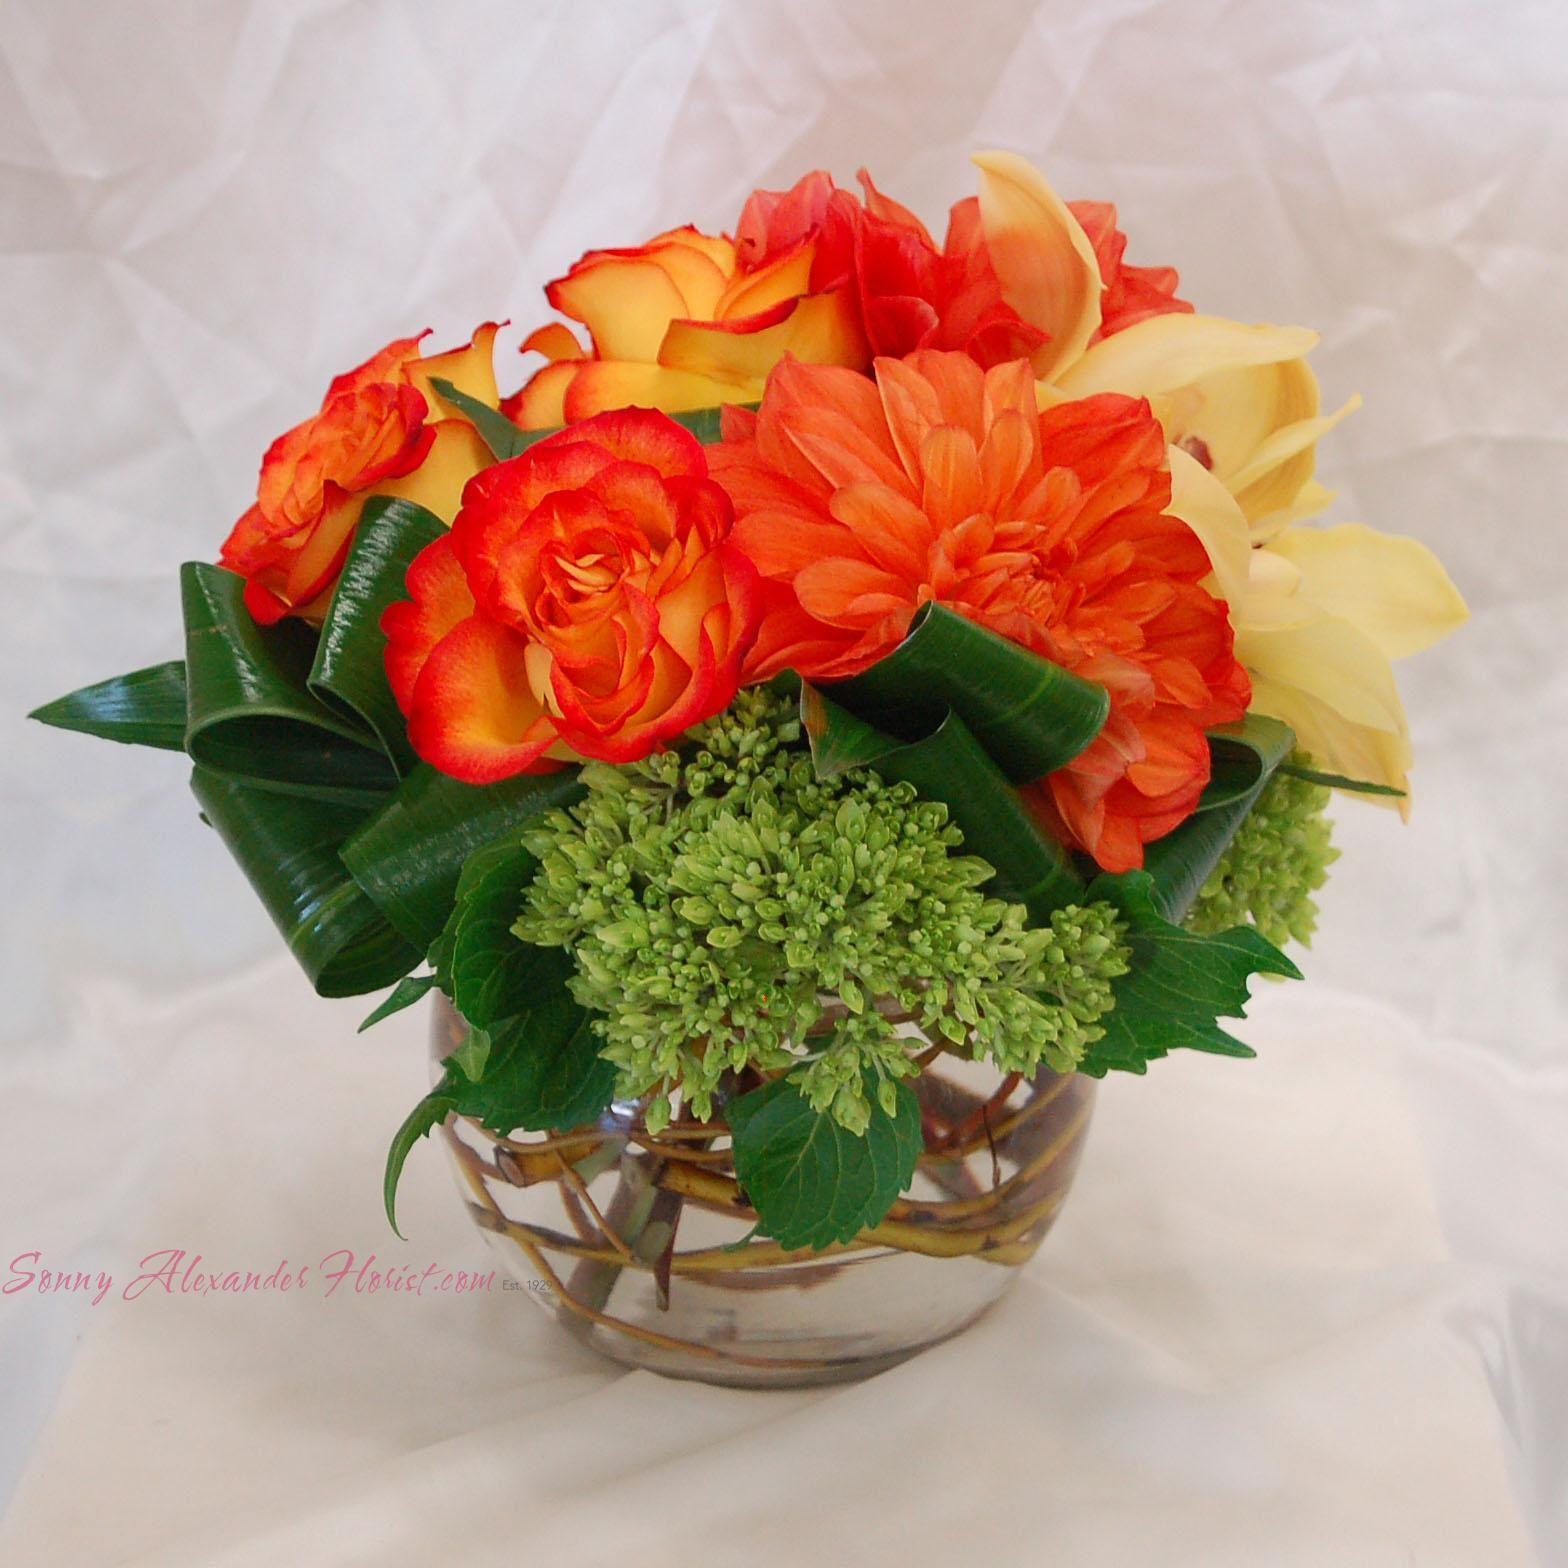 Sonny Alexander Flowers, Orange Floral Arrangement, Flowers, Flower Low And